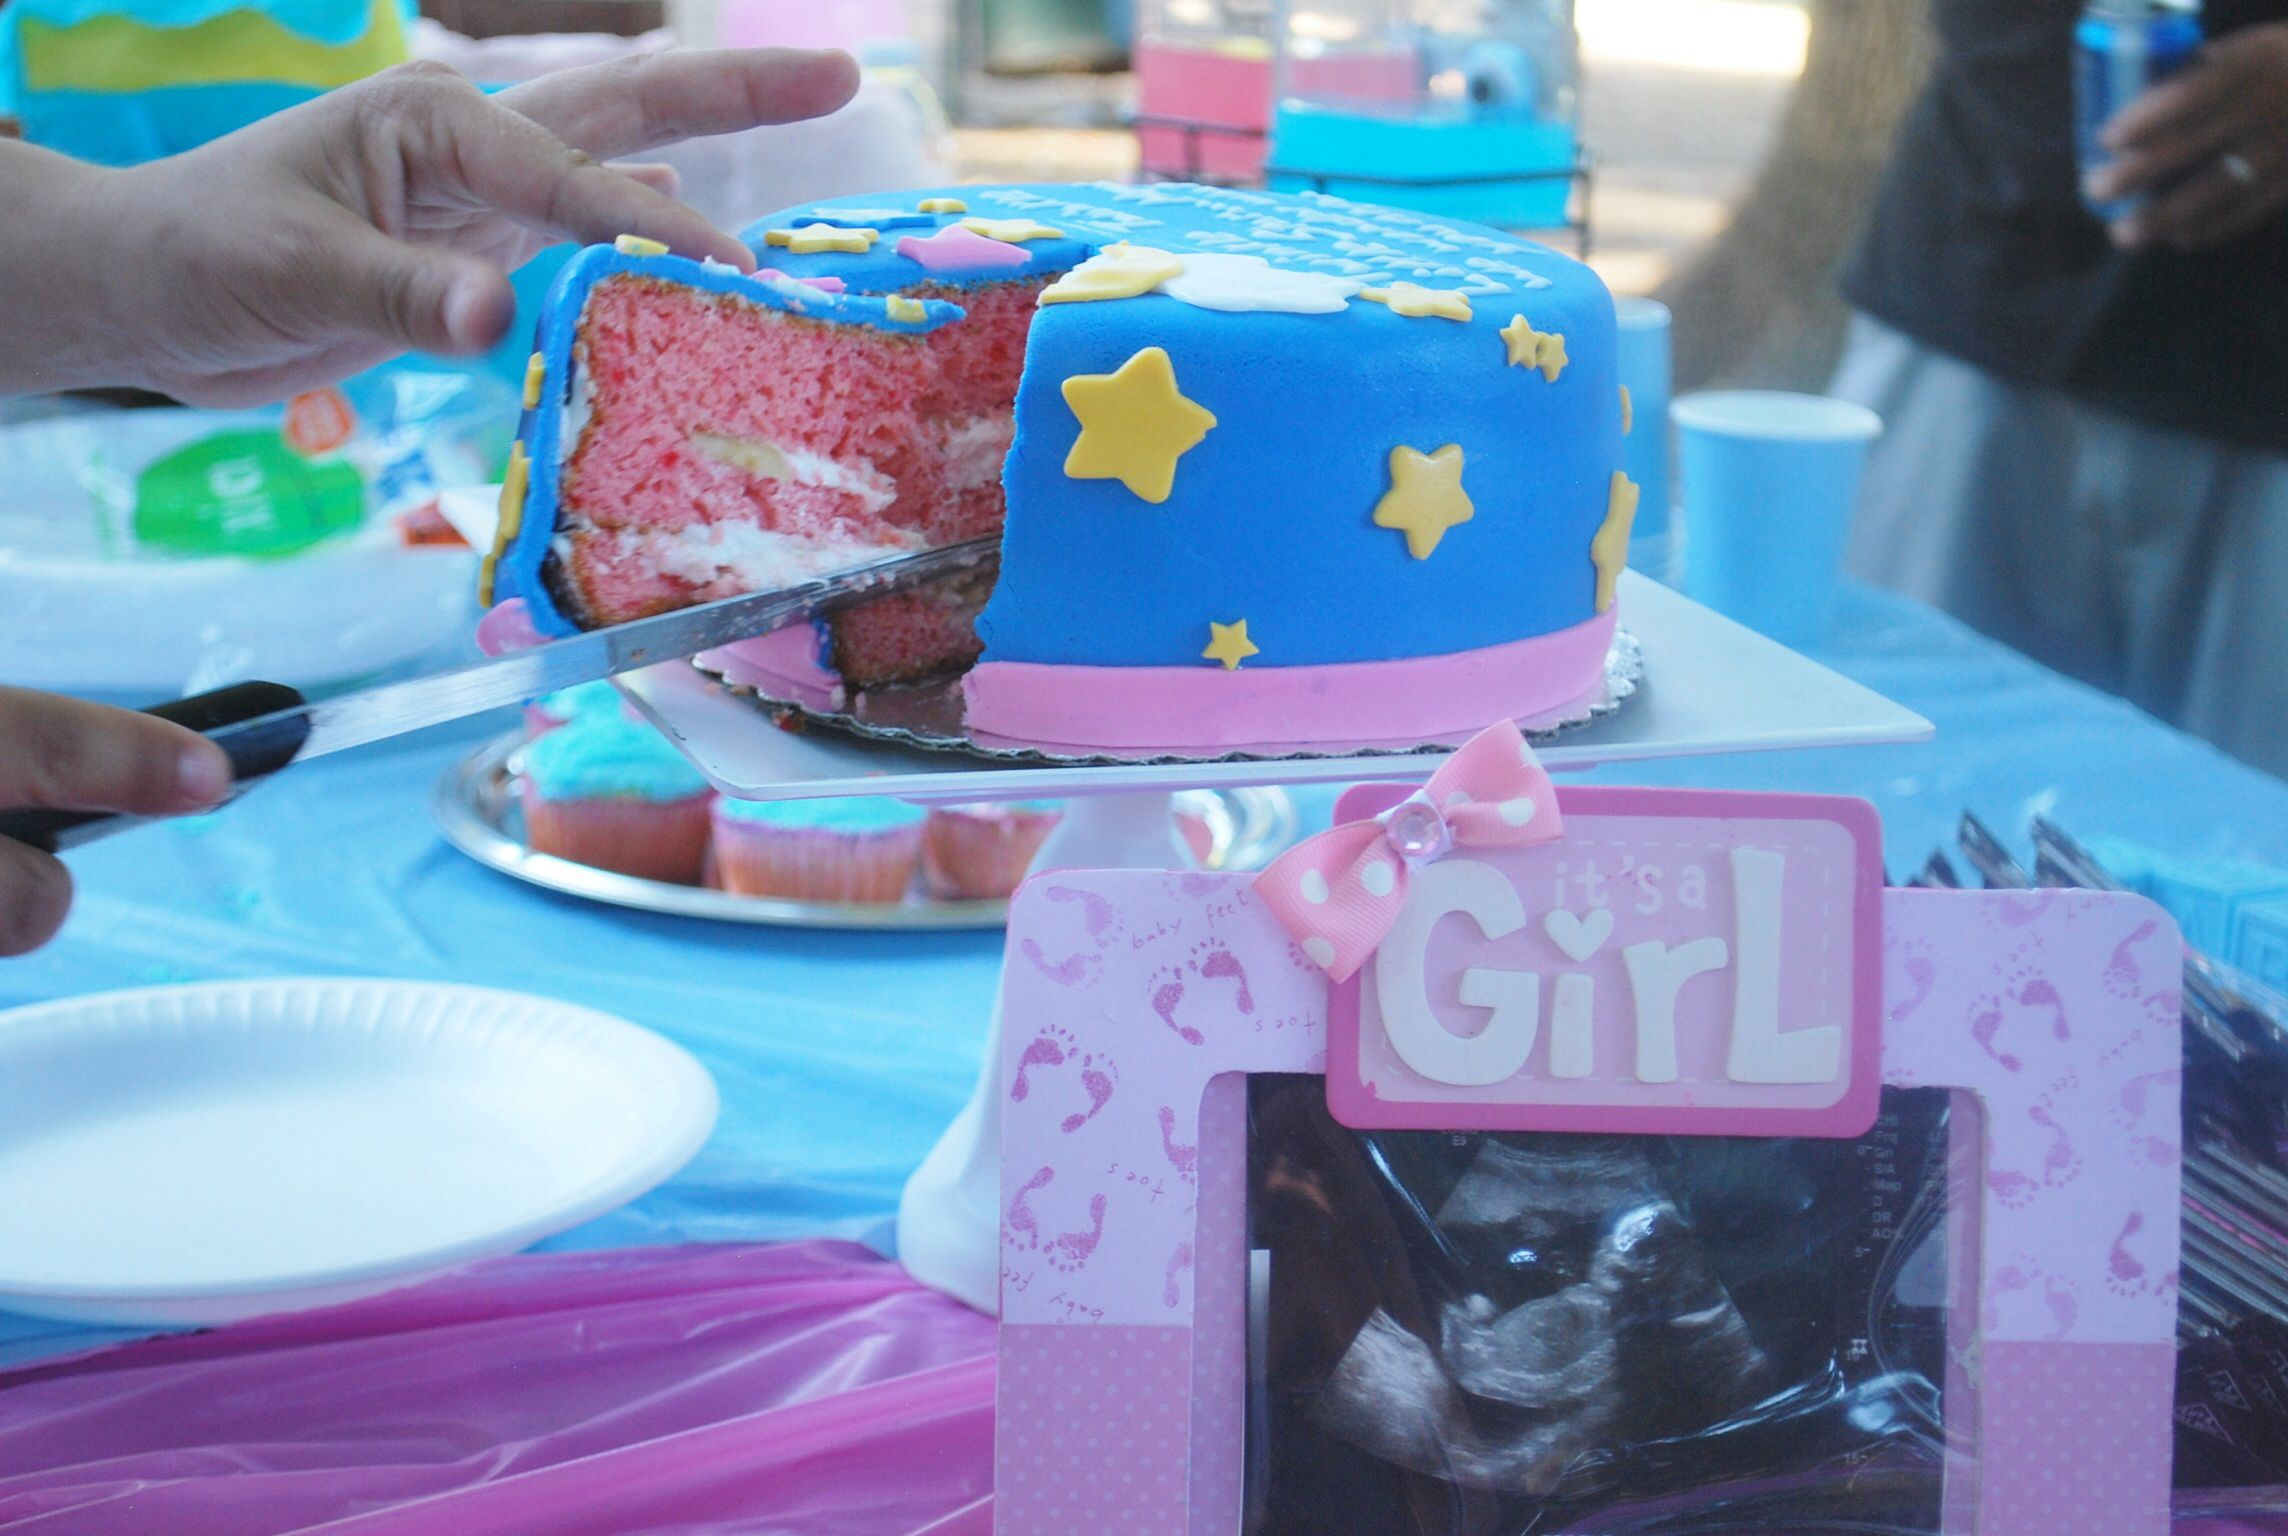 #itsagirl gender reveal cake